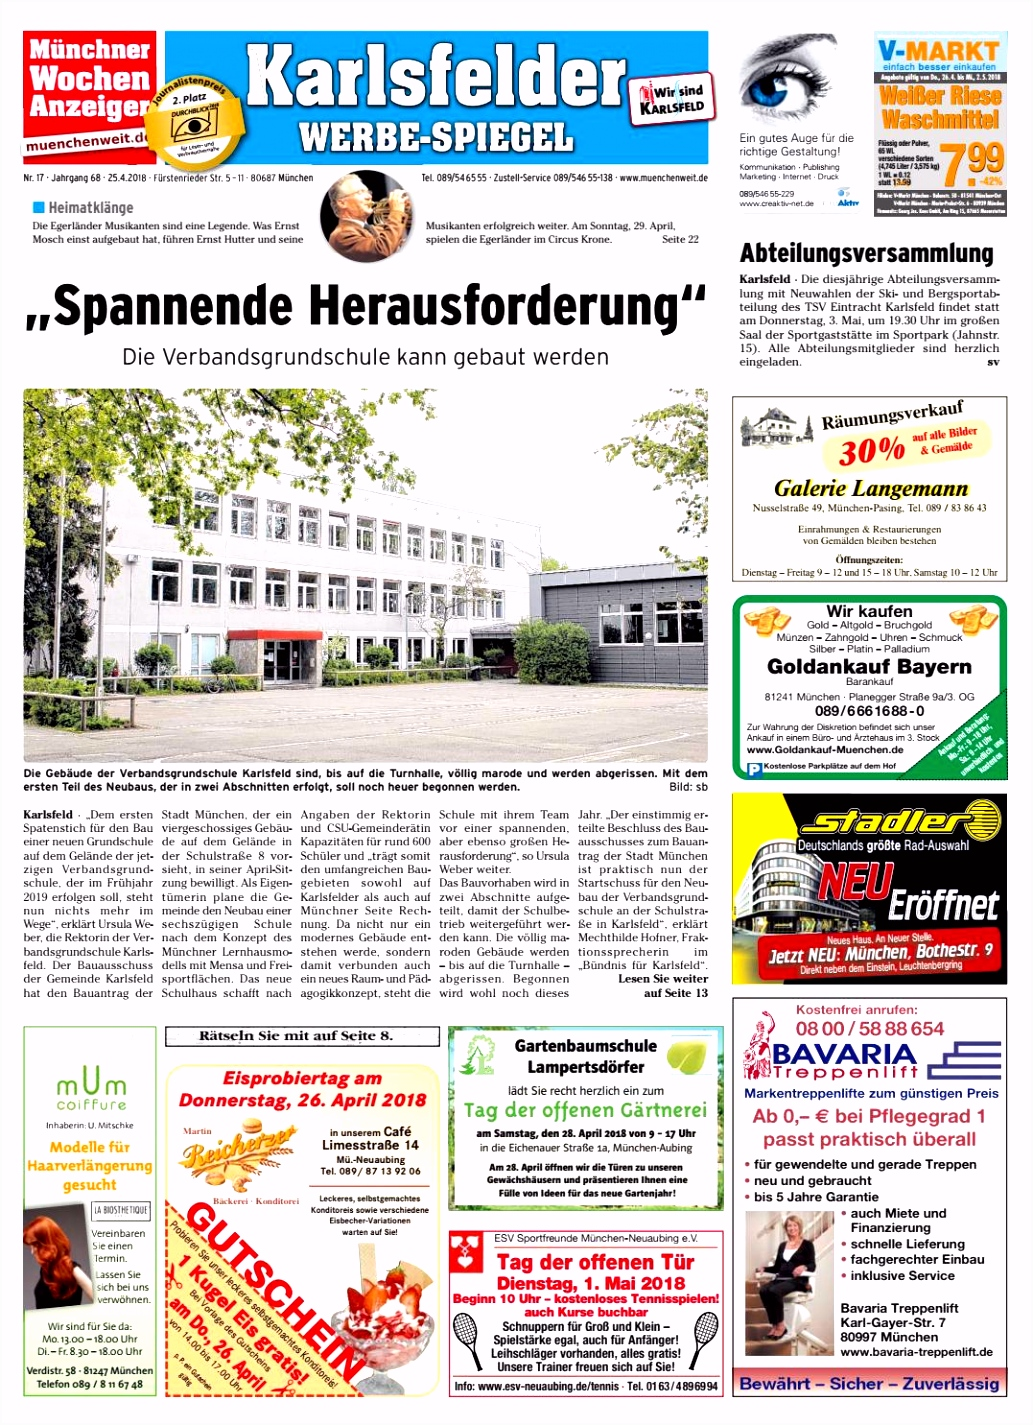 KW 17 2018 by Wochenanzeiger Me n GmbH issuu